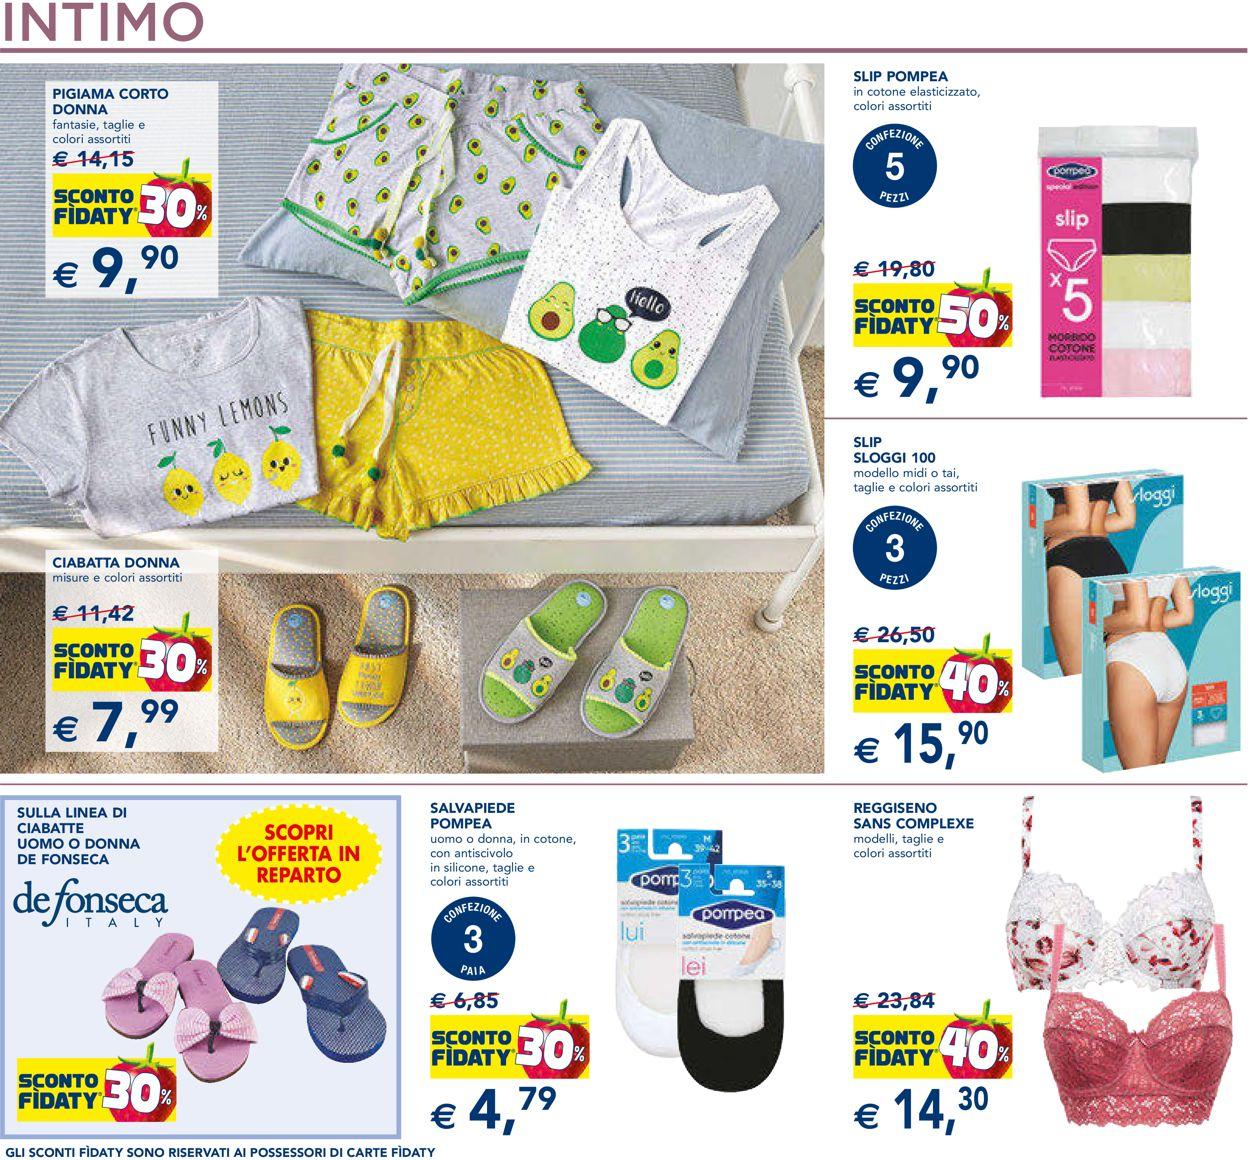 Volantino Esselunga - Offerte 25/06-08/07/2020 (Pagina 12)